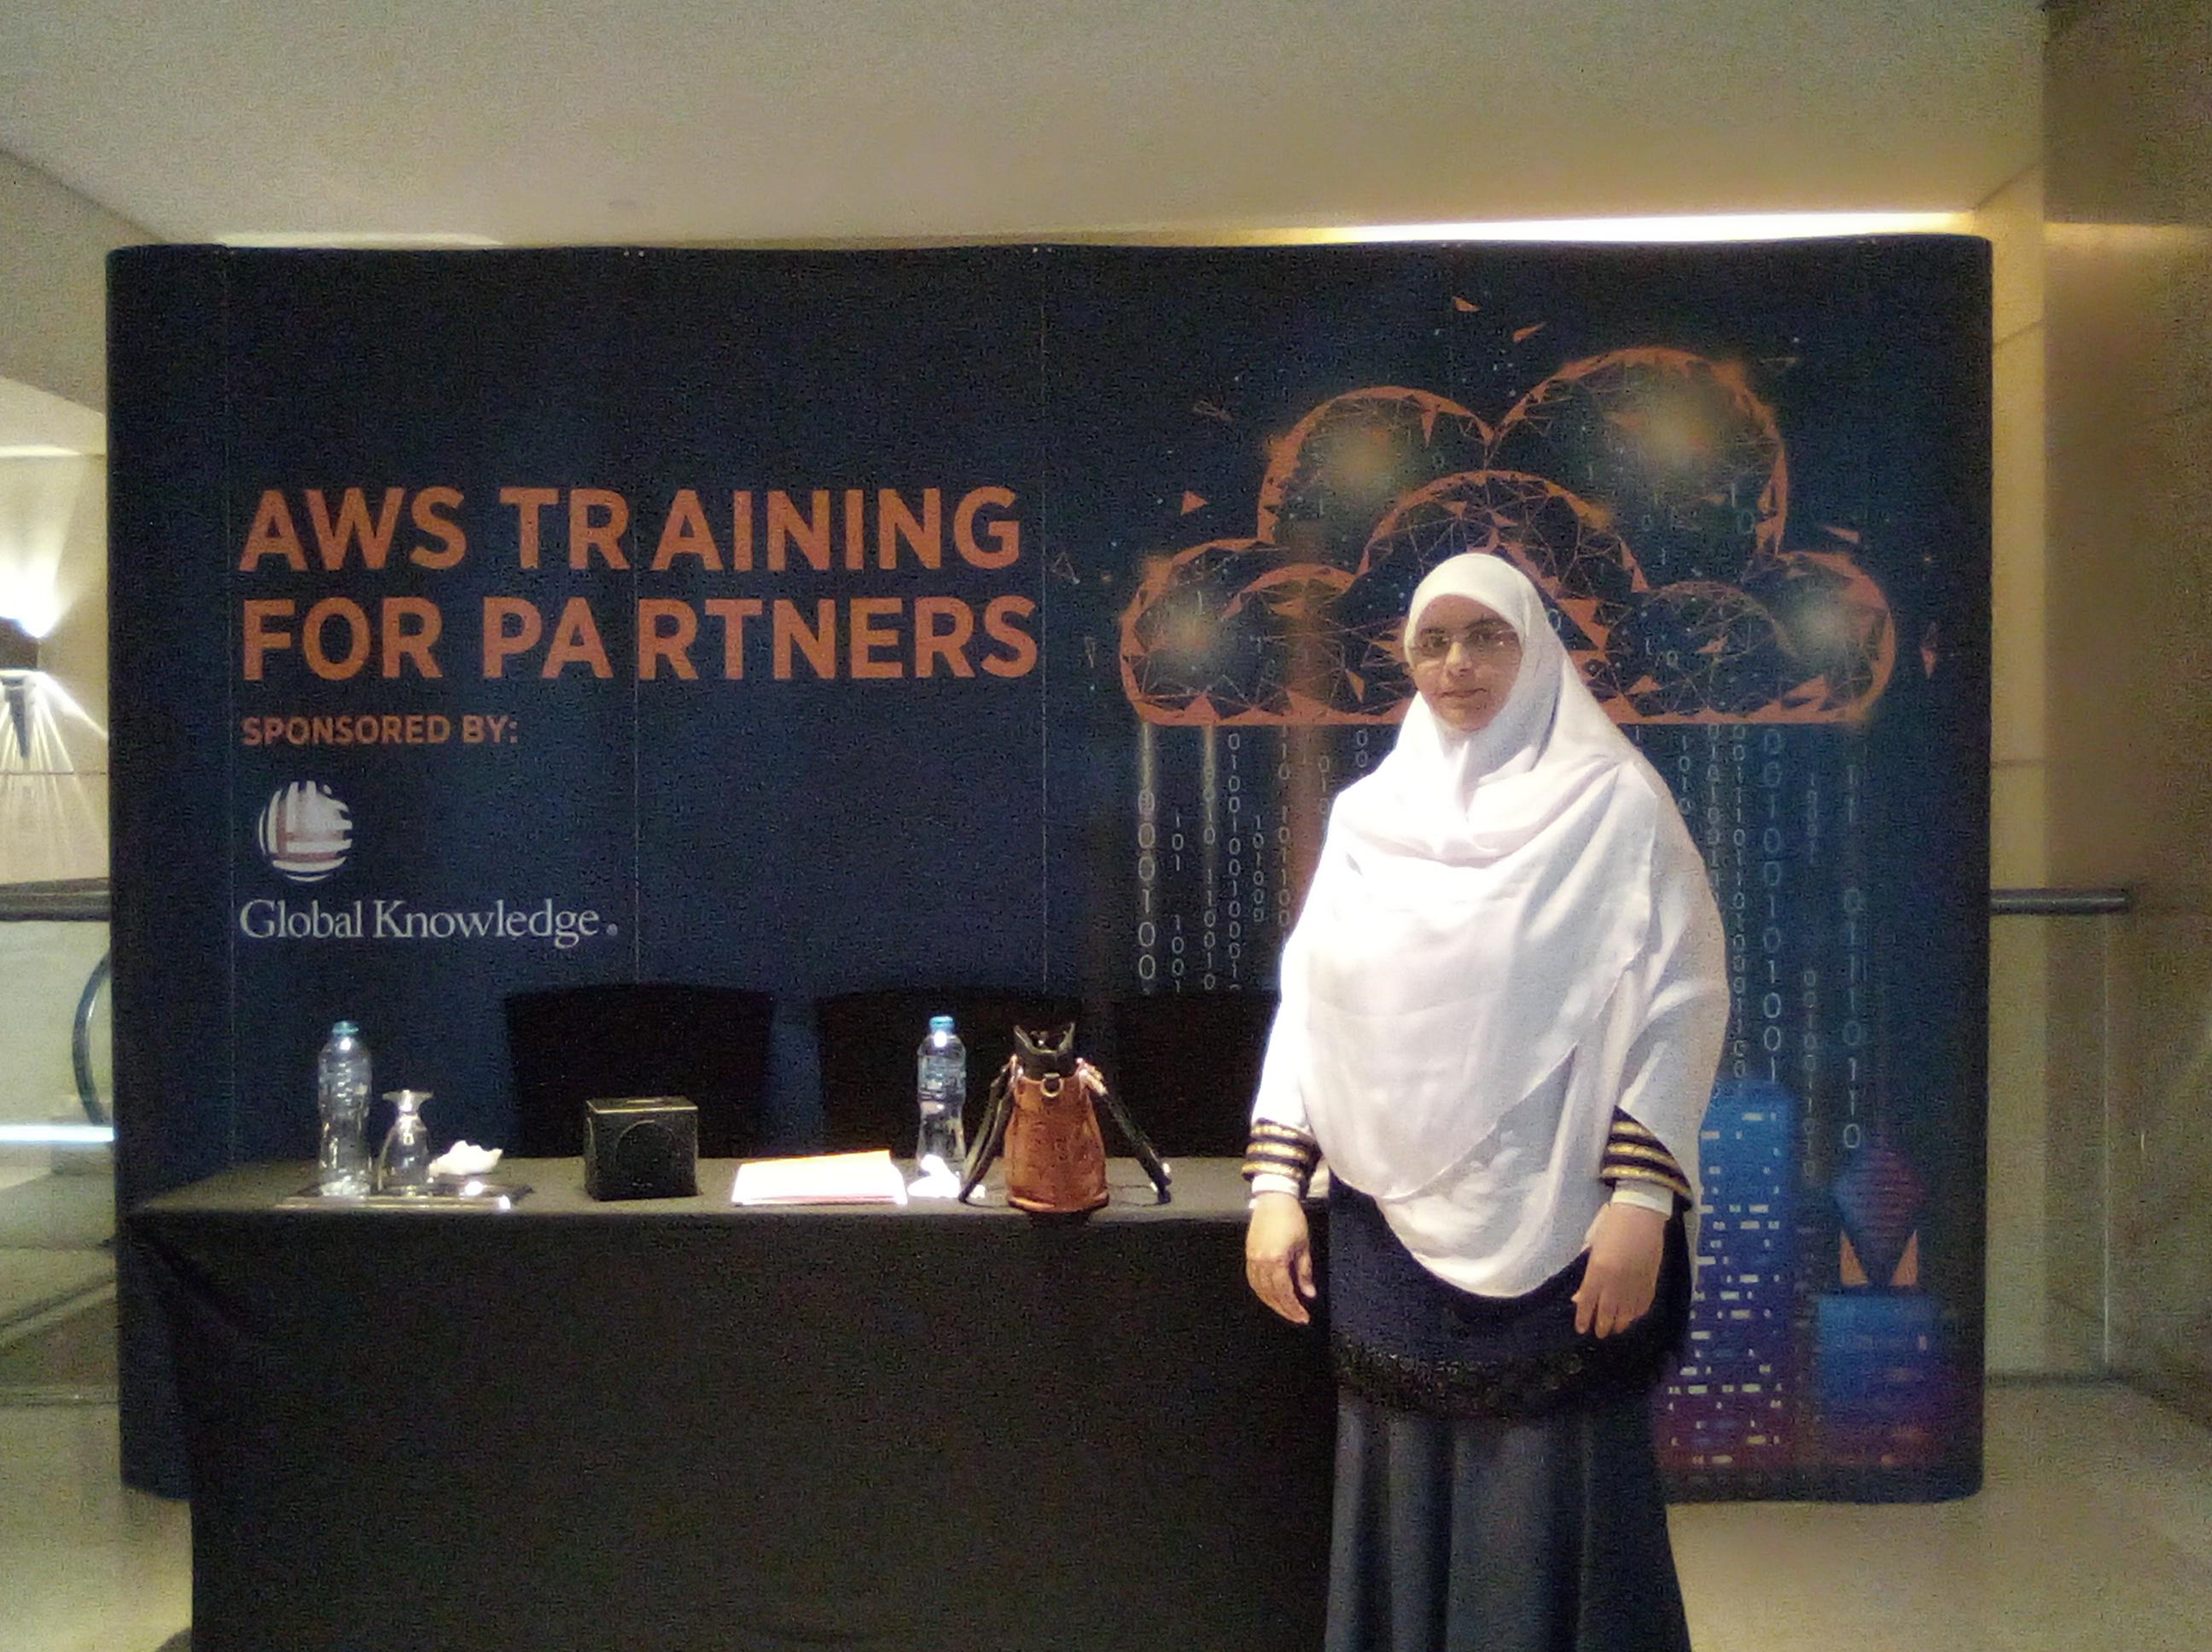 aws-partner-training-jun2019-cairo